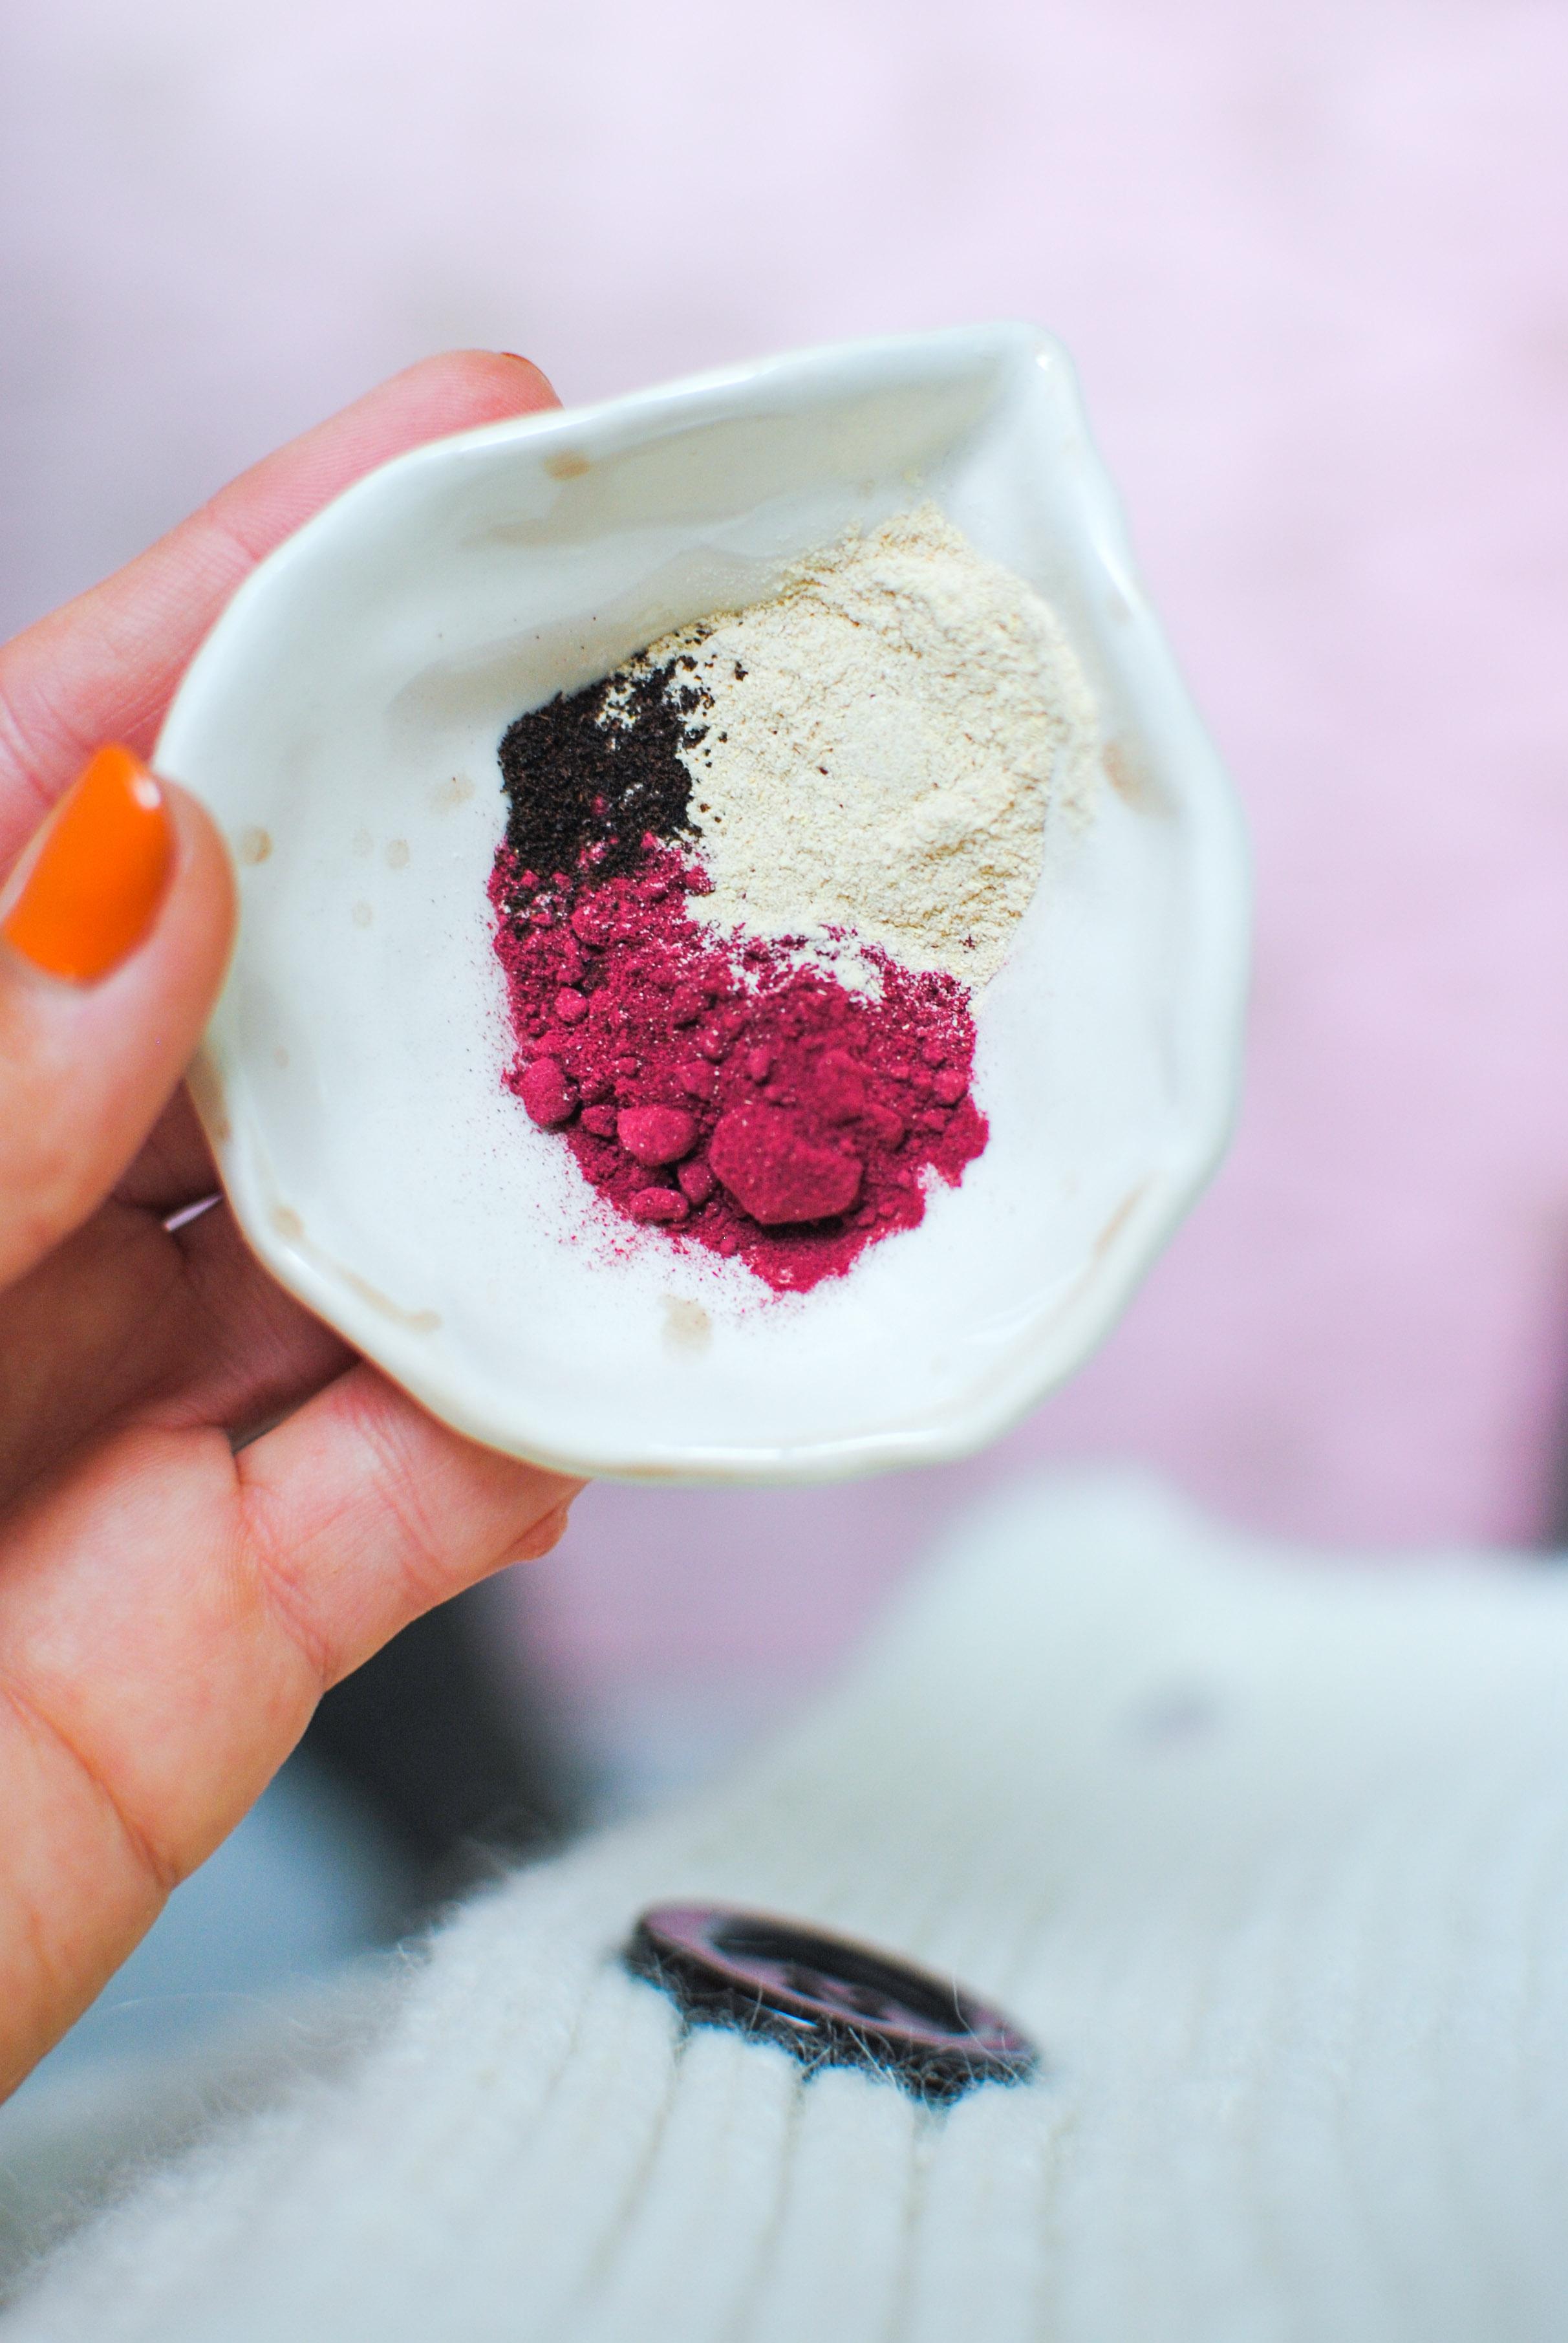 pink beetroot latte   please consider   joana limao